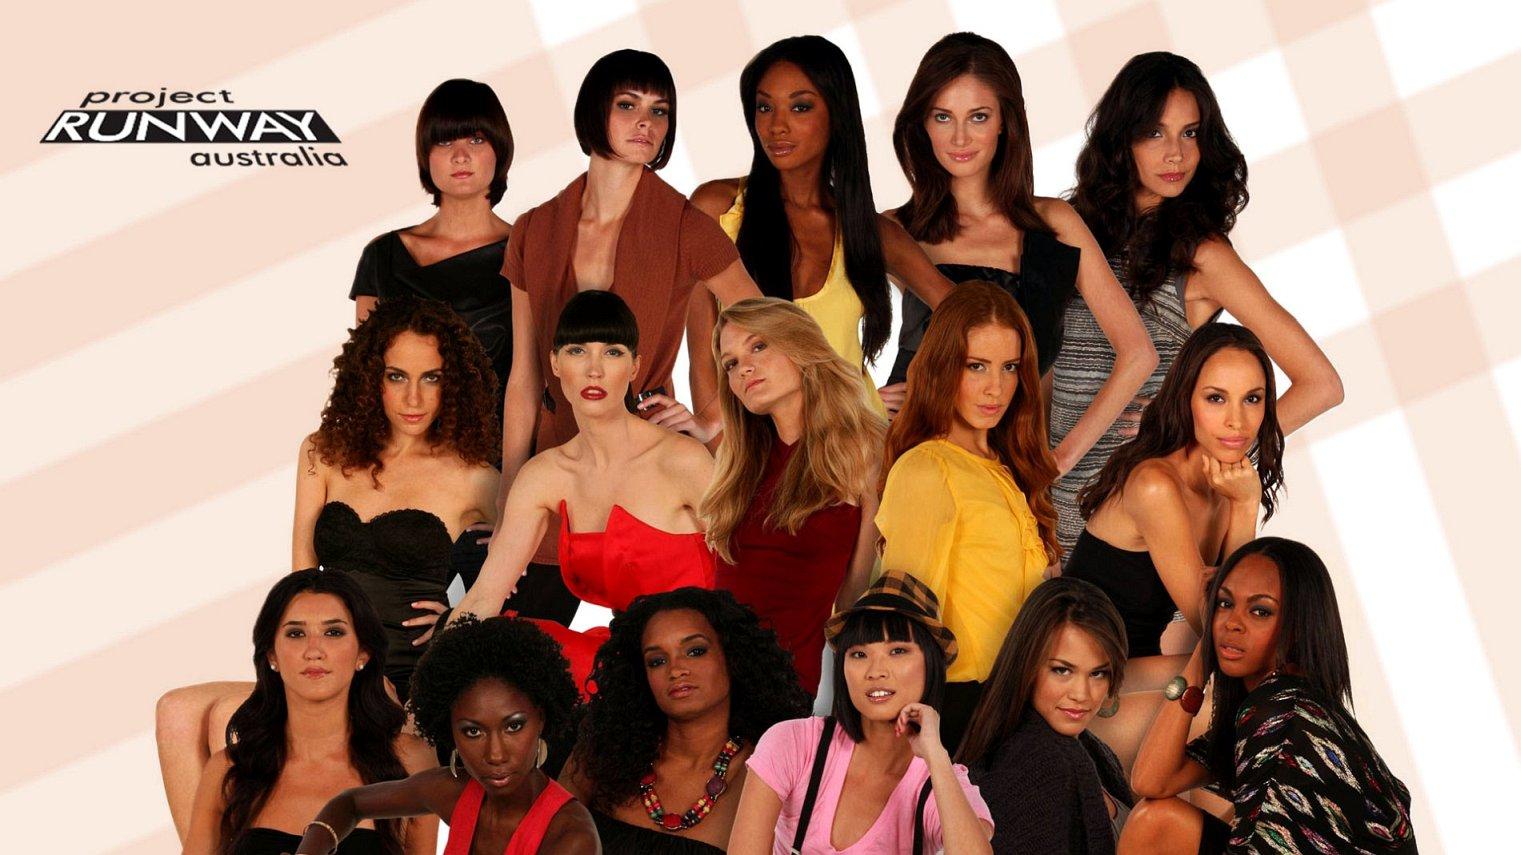 cast of Project Runway Australia season 4